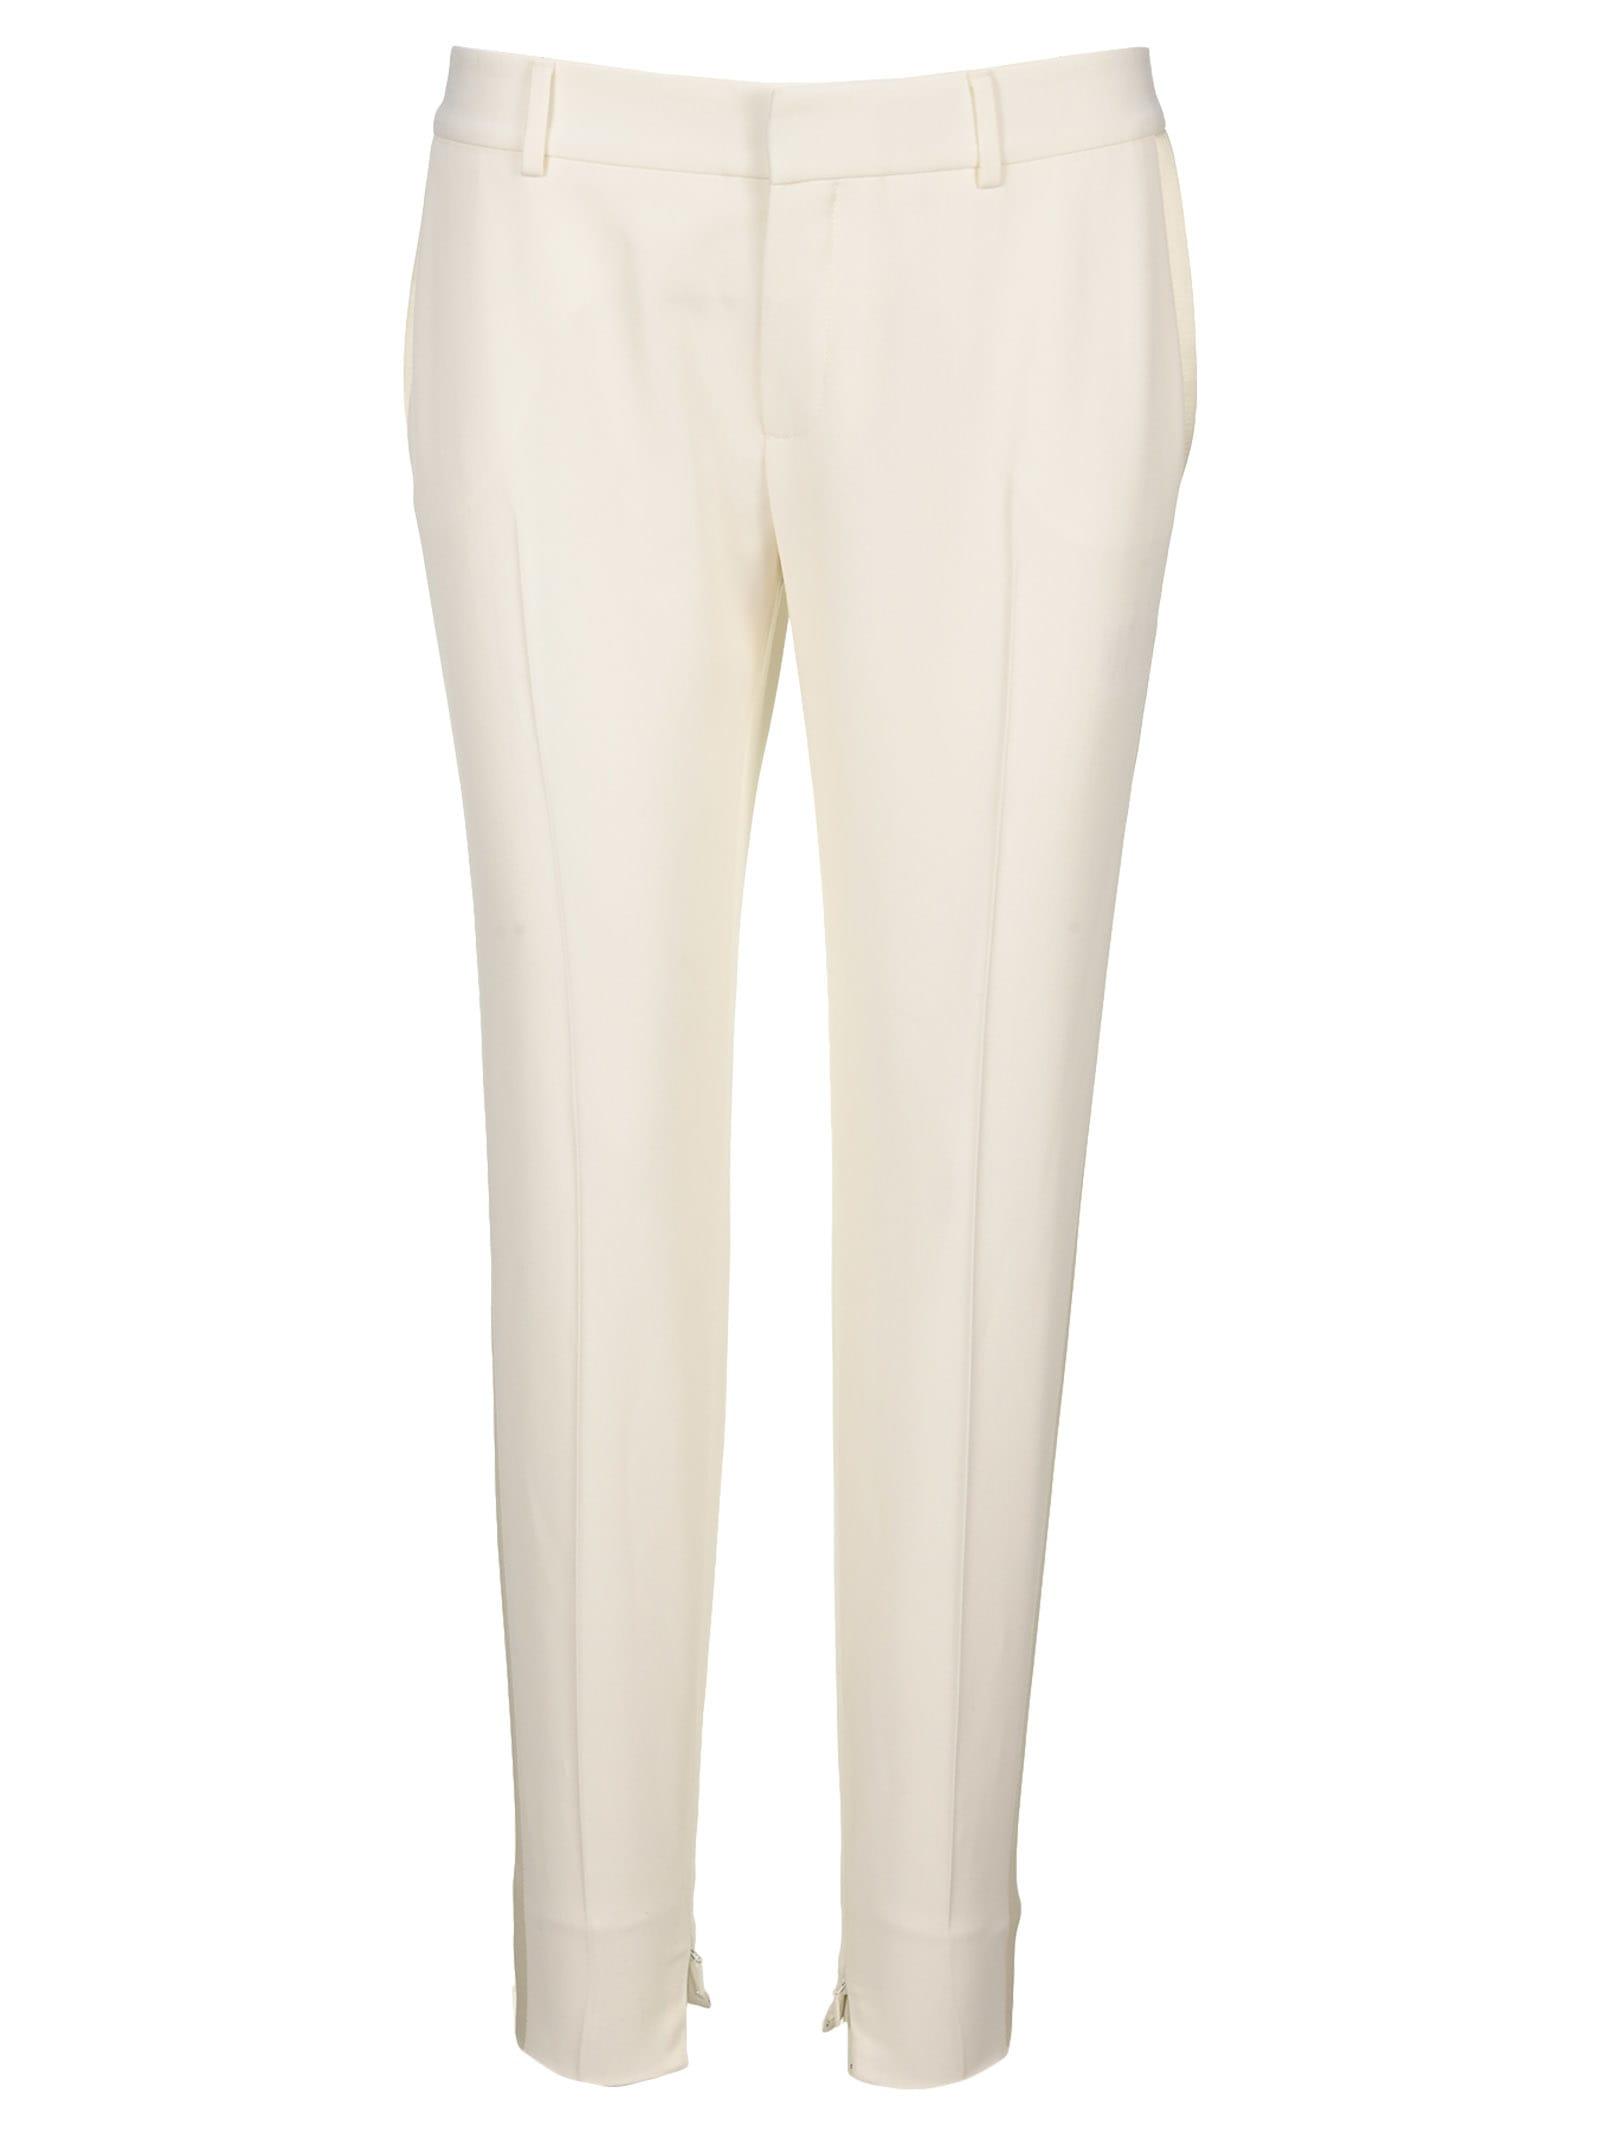 Saint Laurent Tuxedo Pants In White